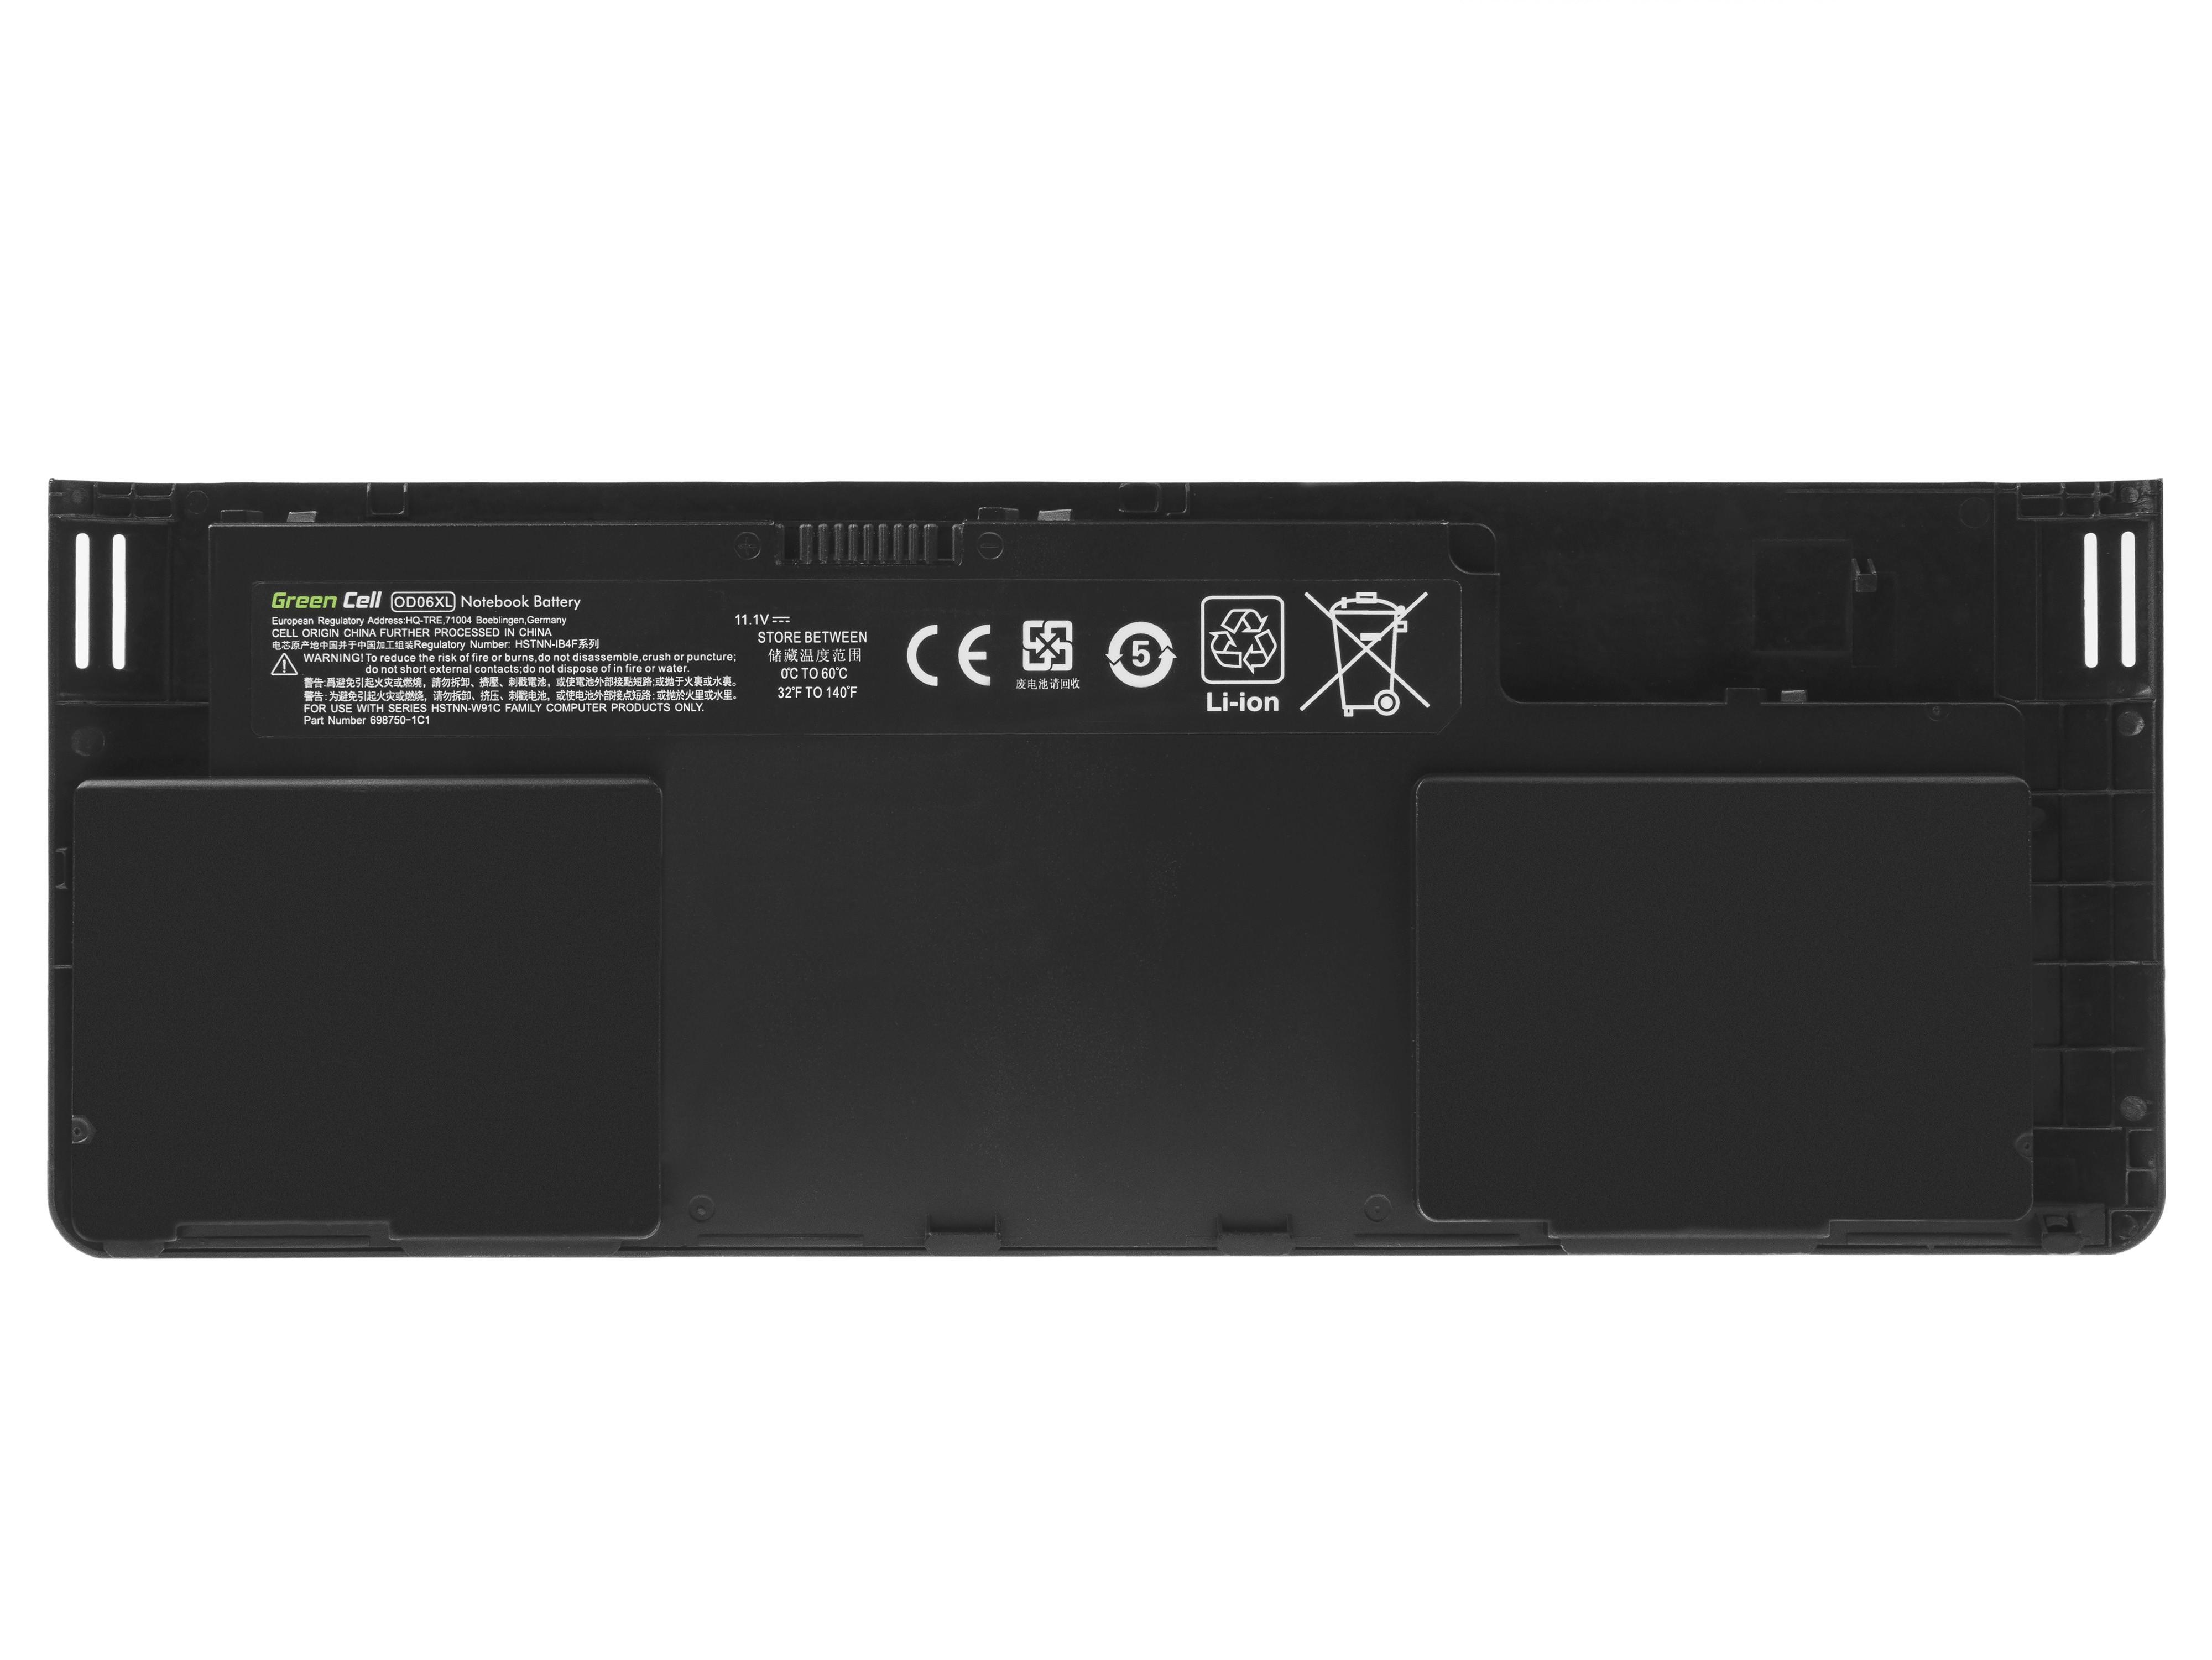 Green Cell HP148 Baterie HP OD06XL HSTNN-IB4F HP EliteBook Revolve 810 G1 G2 G3 3400mAh Li-Pol – neoriginální